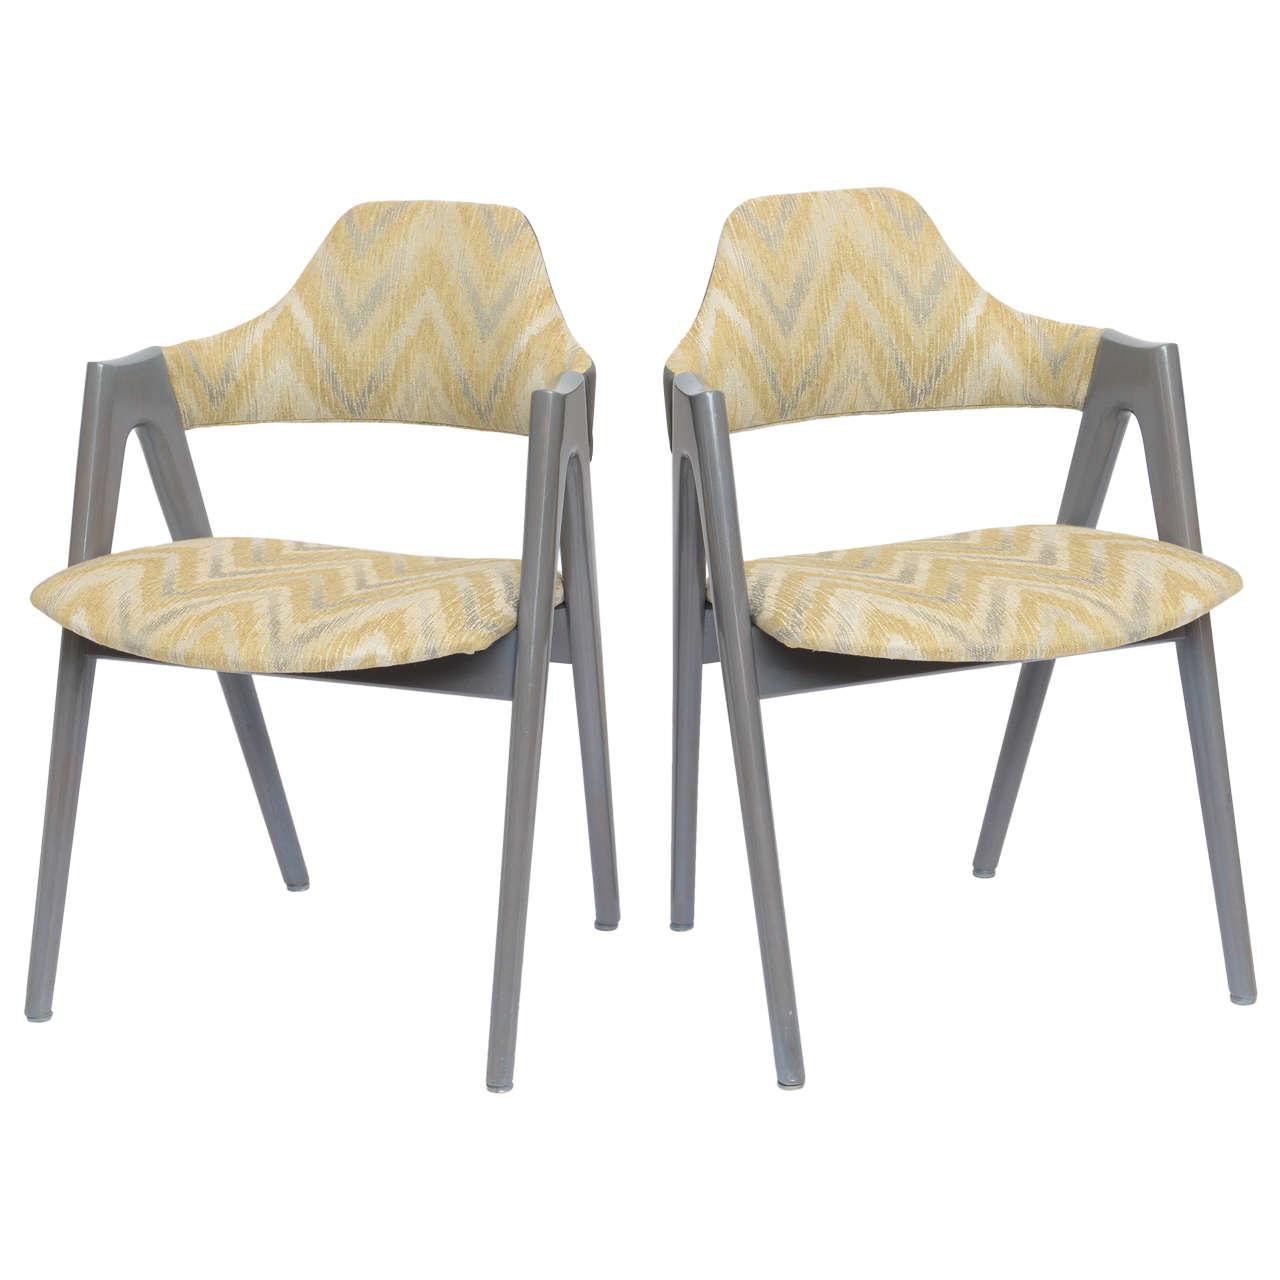 Original Vintage Kai Kritiansen Compass SVA Mobler Chairs, Pair